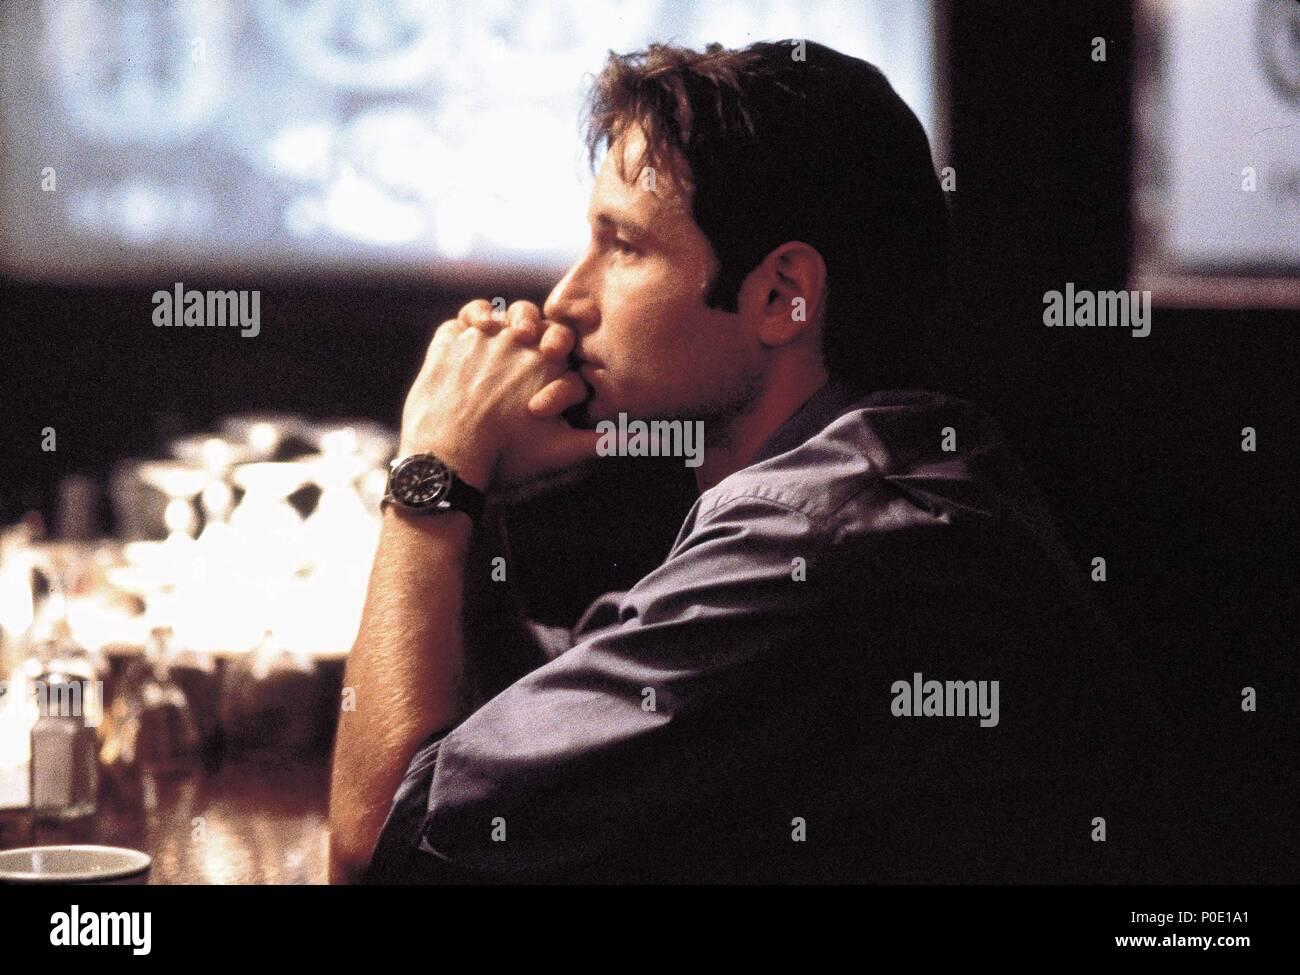 Original Film Title: X-FILES, THE.  English Title: X-FILES, THE.  Film Director: ROB BOWMAN.  Year: 1998.  Stars: DAVID DUCHOVNY. Credit: 20TH CENTURY FOX / MORTON, MERRICK / Album - Stock Image